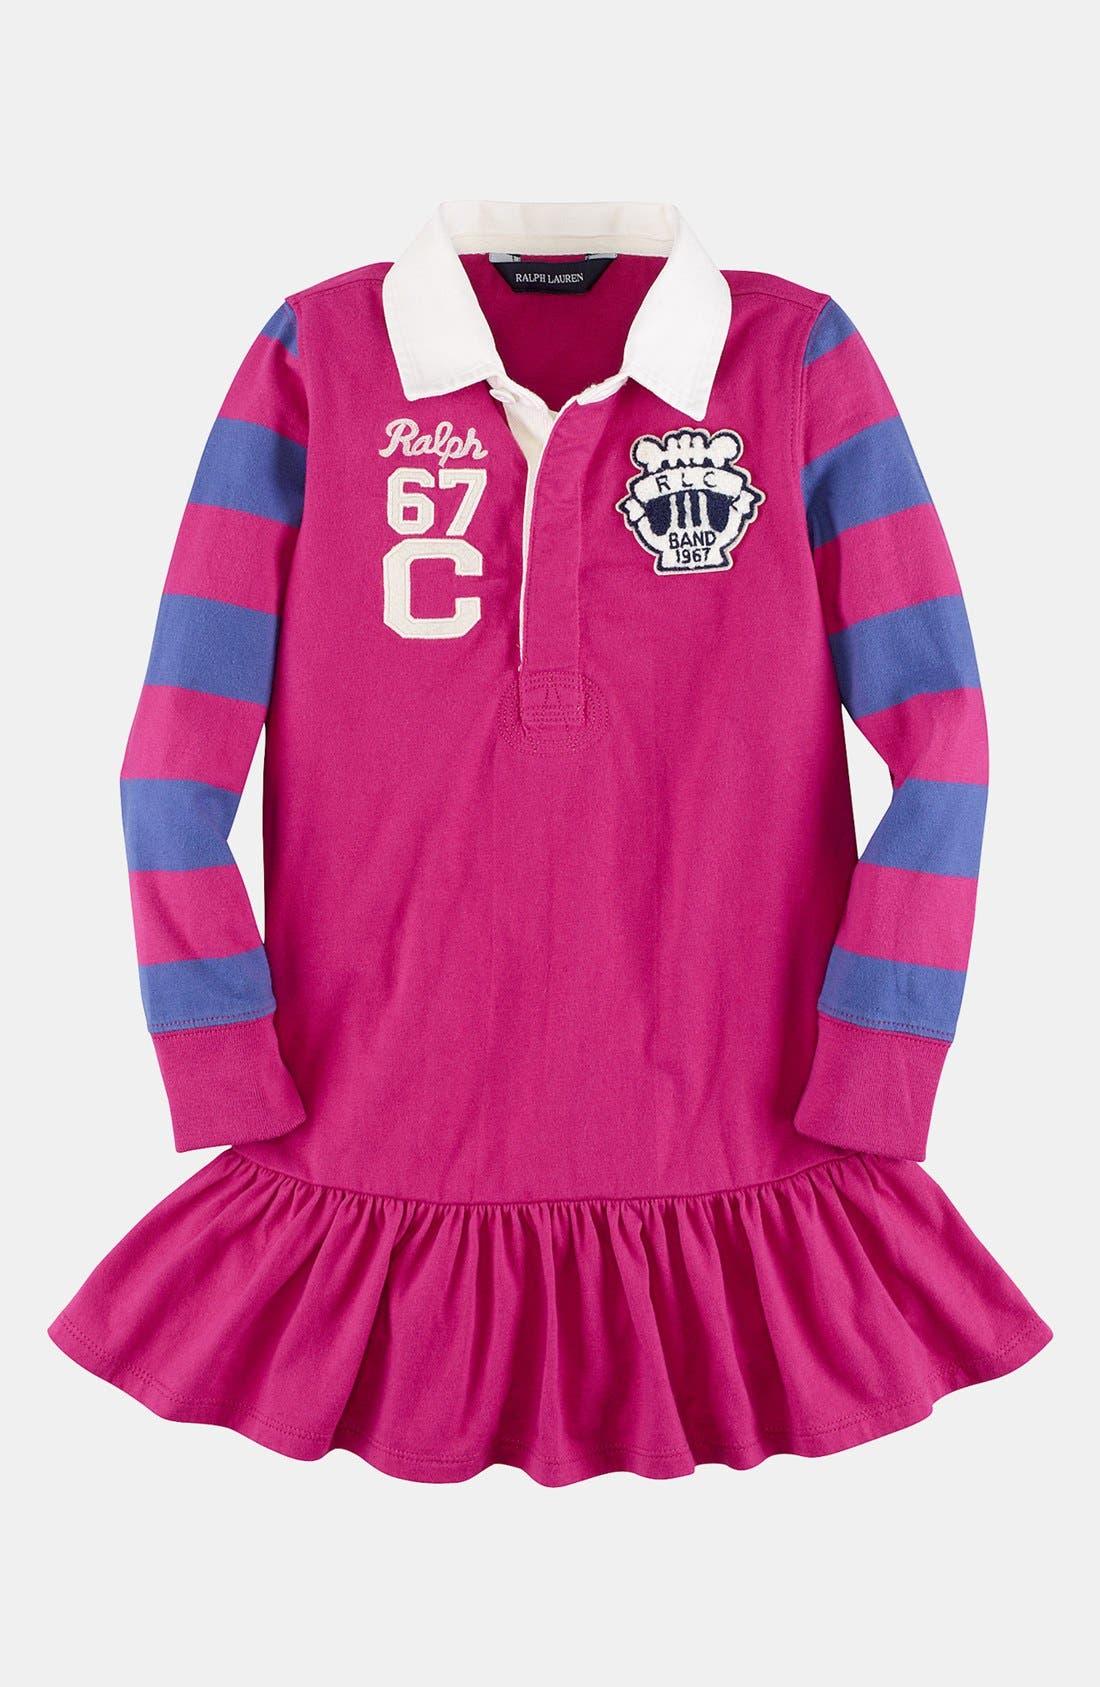 Alternate Image 1 Selected - Ralph Lauren Rugby Dress (Toddler Girls)